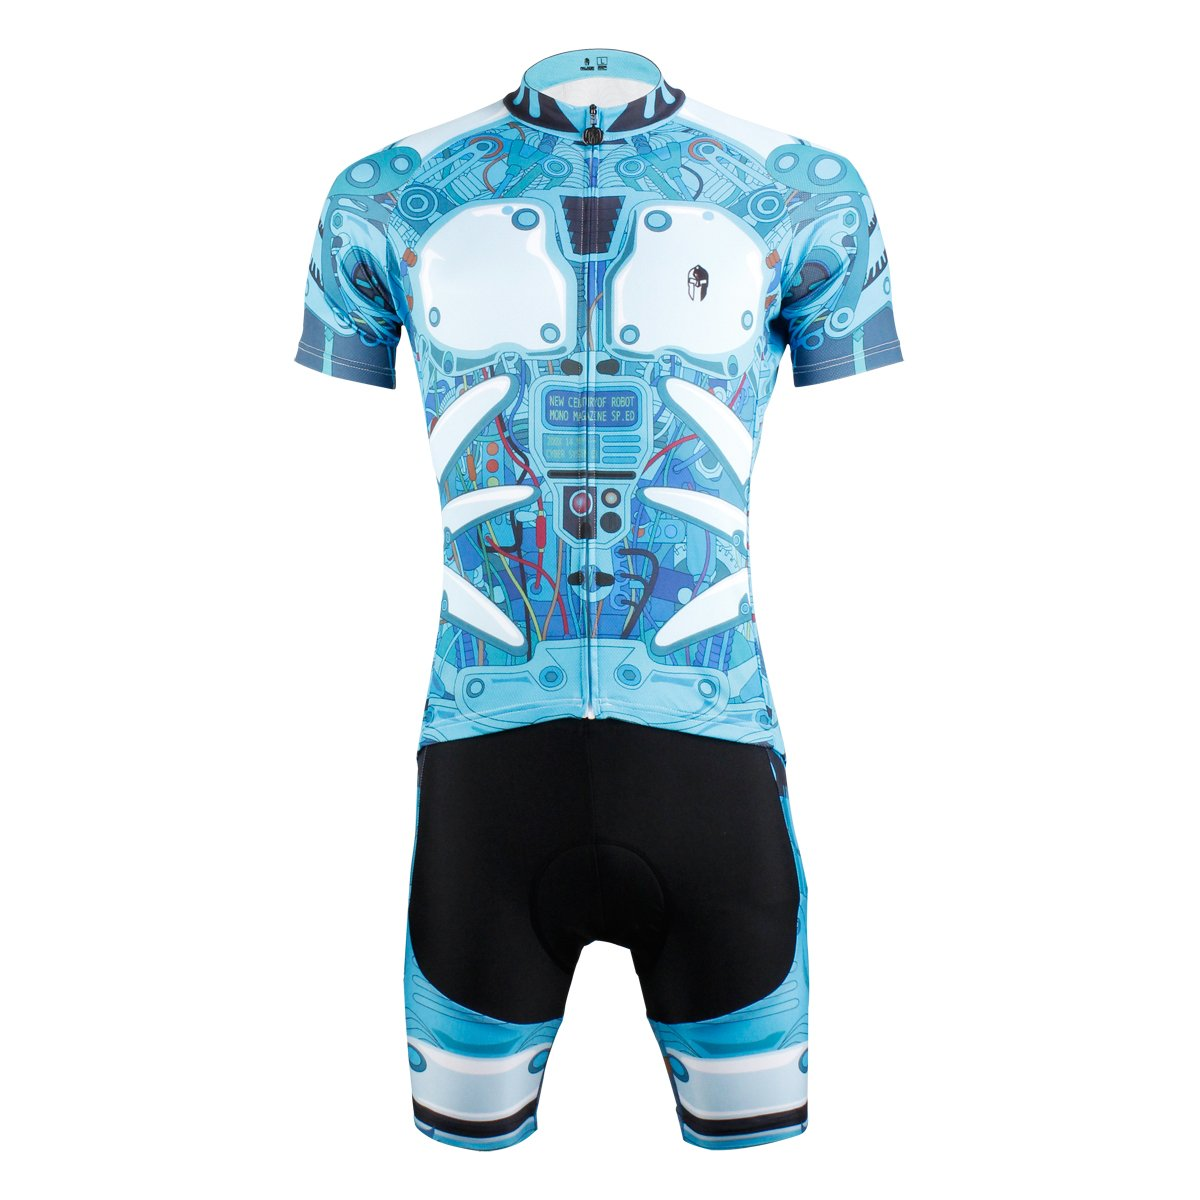 [paladin] サイクルジャージ 上下セット 吸汗速乾 通気がいい 夏用 スポーツ アウトドア サイズ選択可 X-Large  B01ET1OP2Y